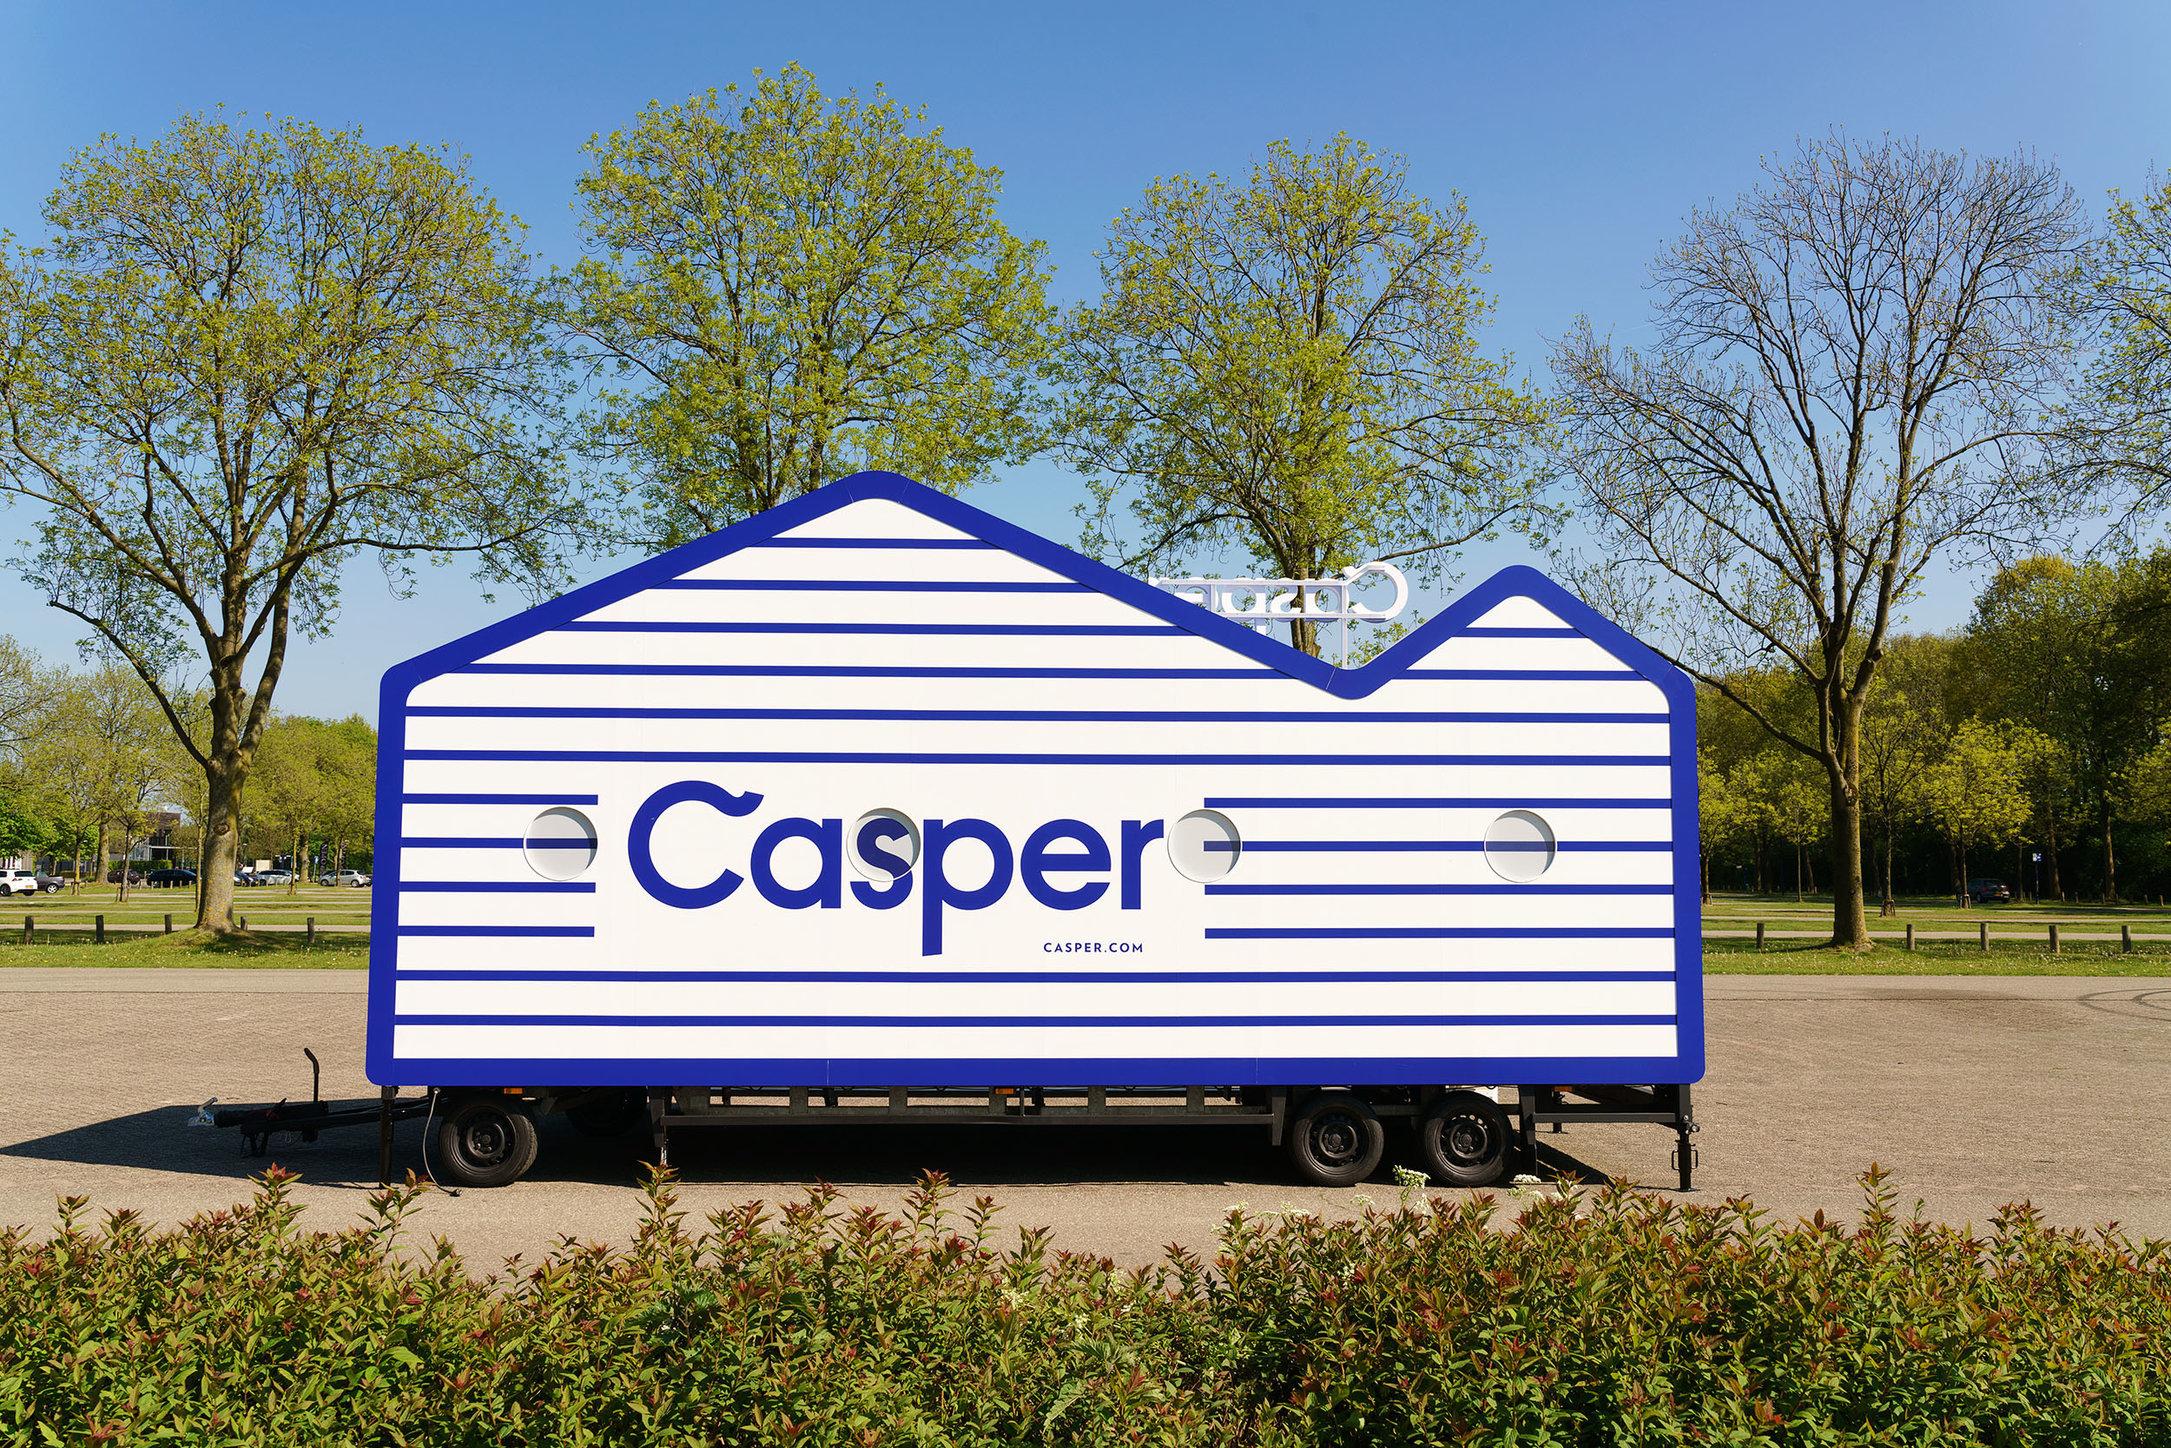 20170510 Casper-Wink by_M_Immink 112.jpg